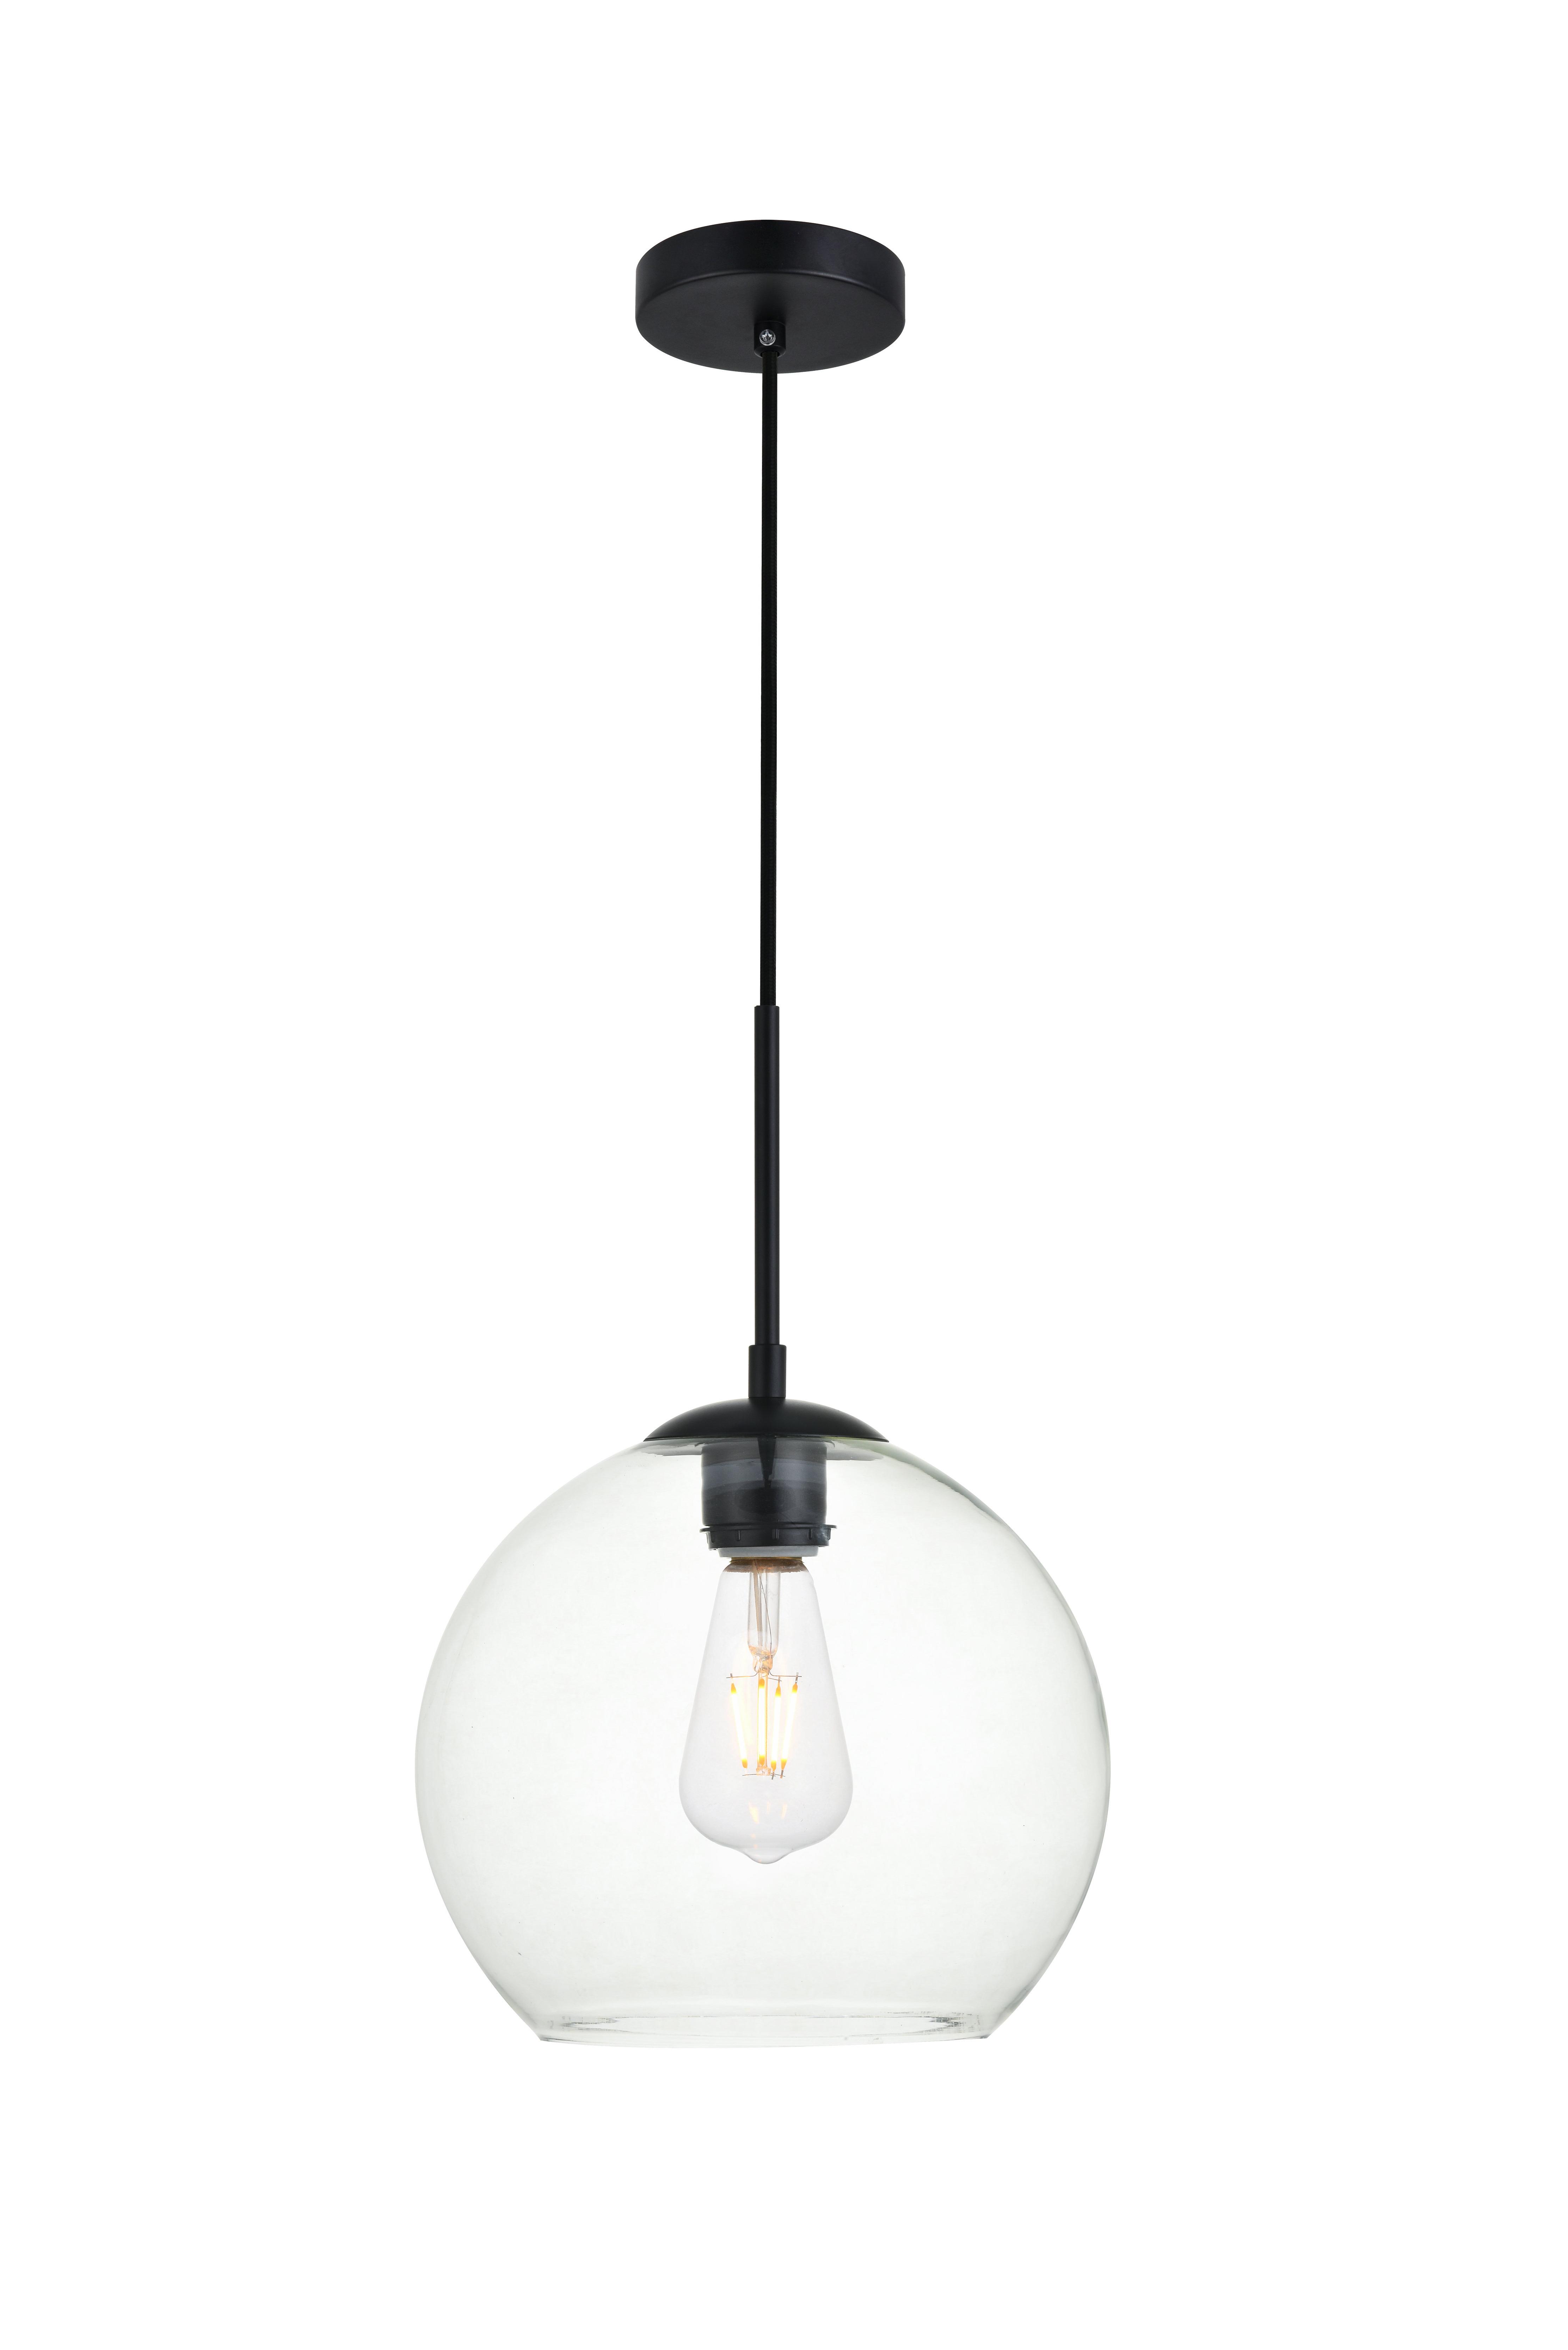 Yearwood 1 Light Single Globe Pendant Pertaining To Fashionable Gehry 1 Light Single Globe Pendants (View 20 of 20)